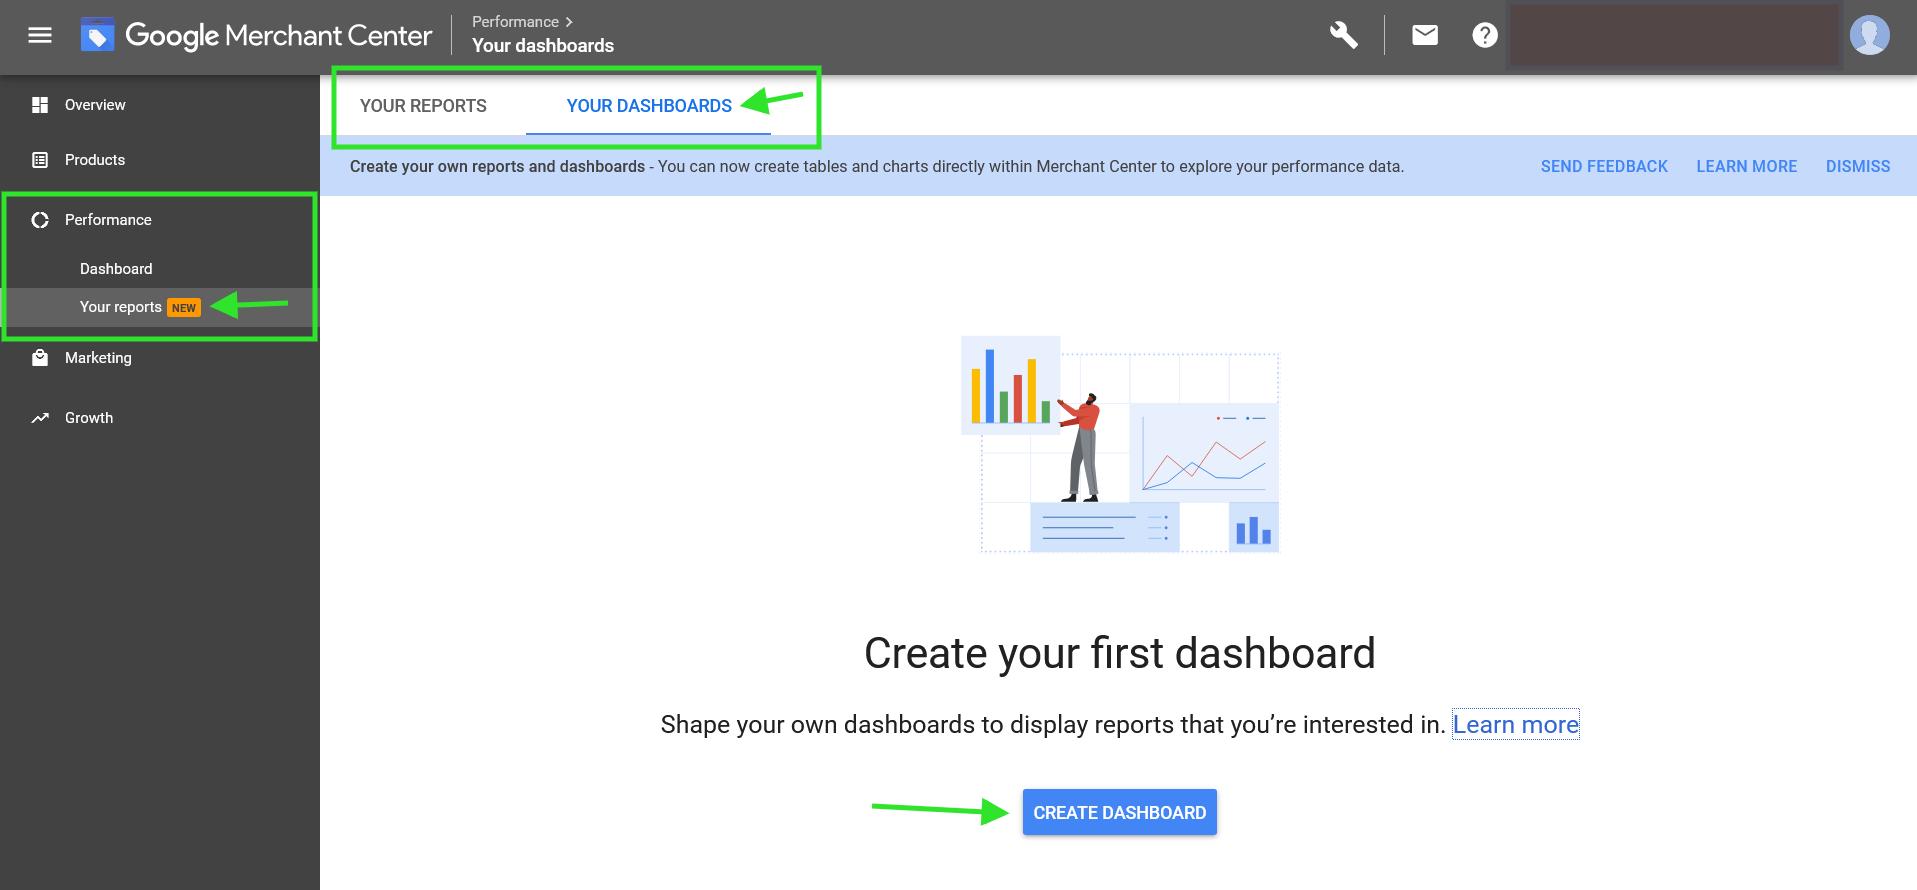 Google Merchant Center custom dashboard creation